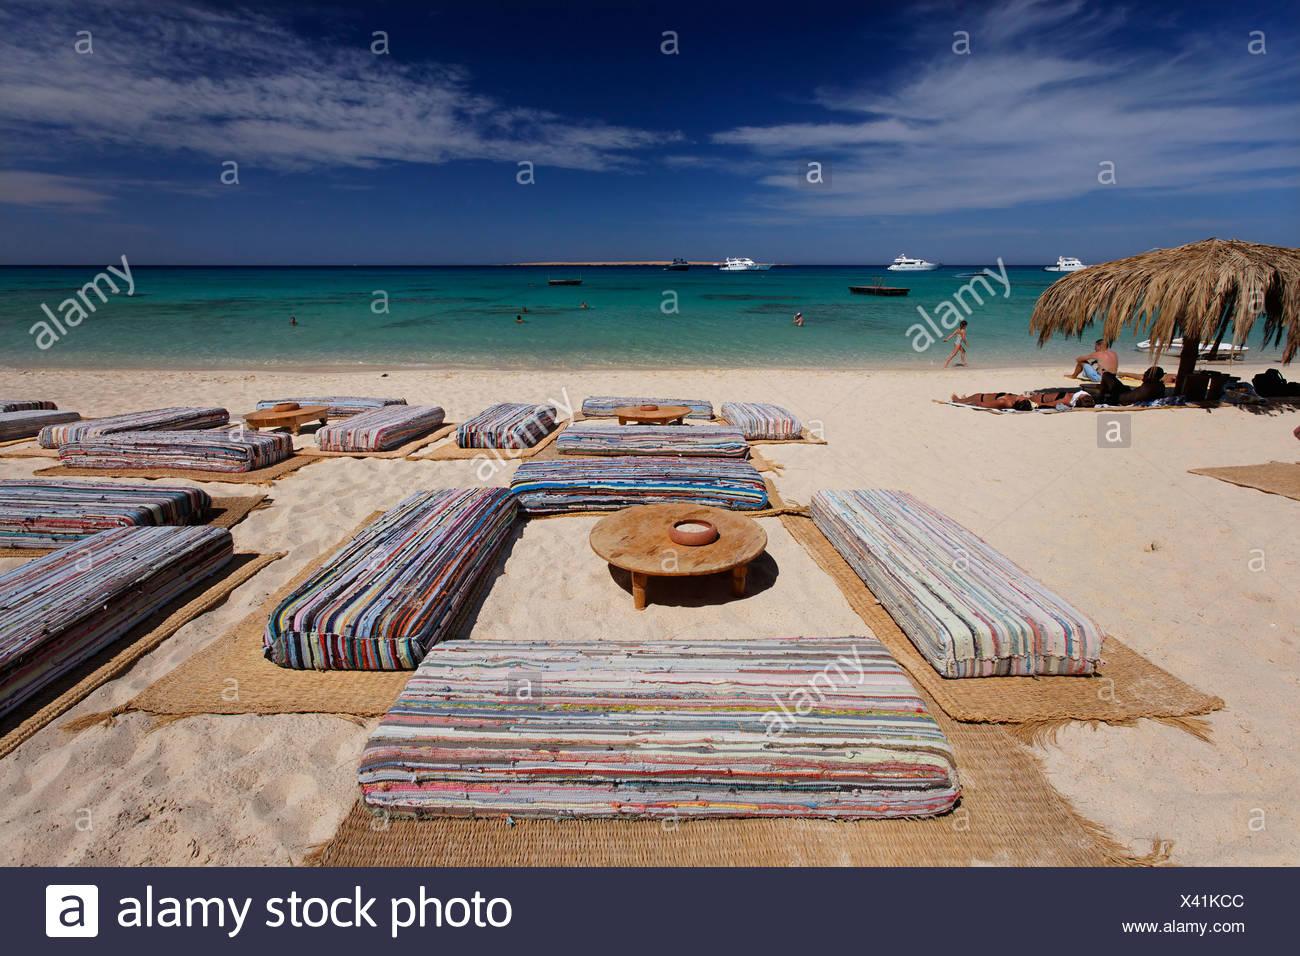 Pillow seats, beach, lagoon, horizon, parasol, Mahmya, Giftun Island, Hurghada, Egypt, Africa, Red Sea - Stock Image